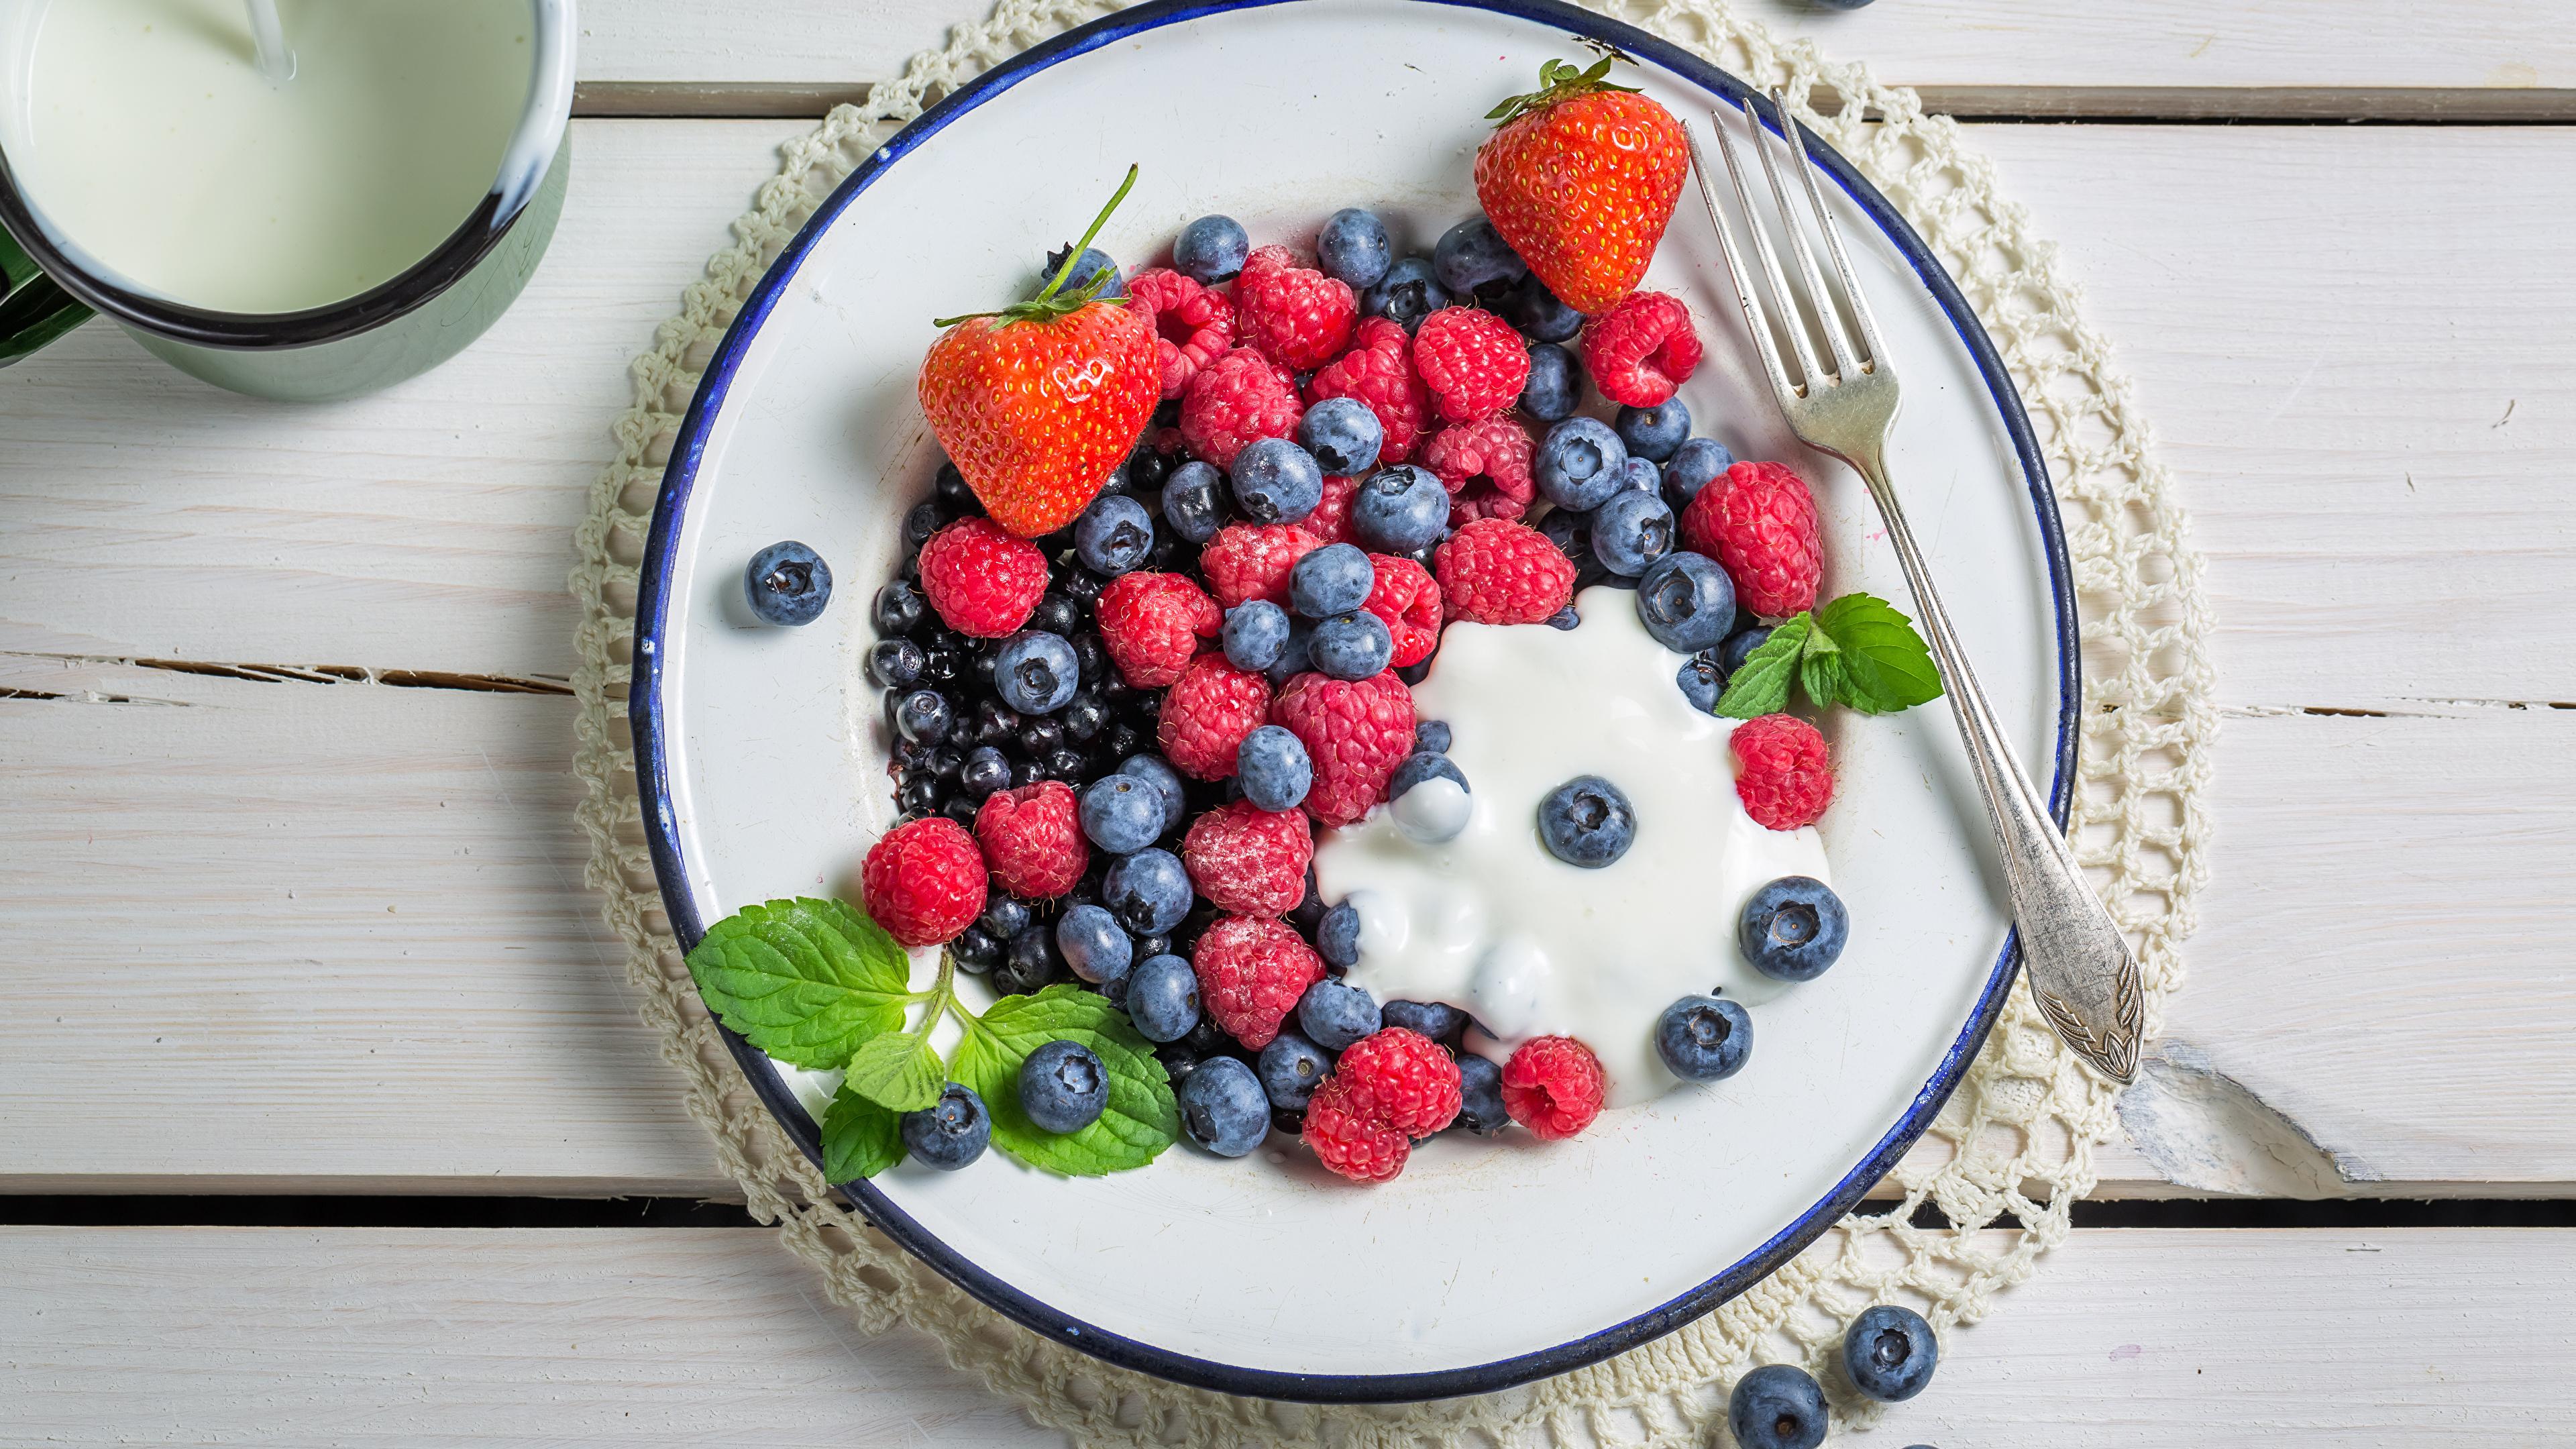 Фото Малина Черника Еда Ягоды Тарелка 3840x2160 Пища тарелке Продукты питания